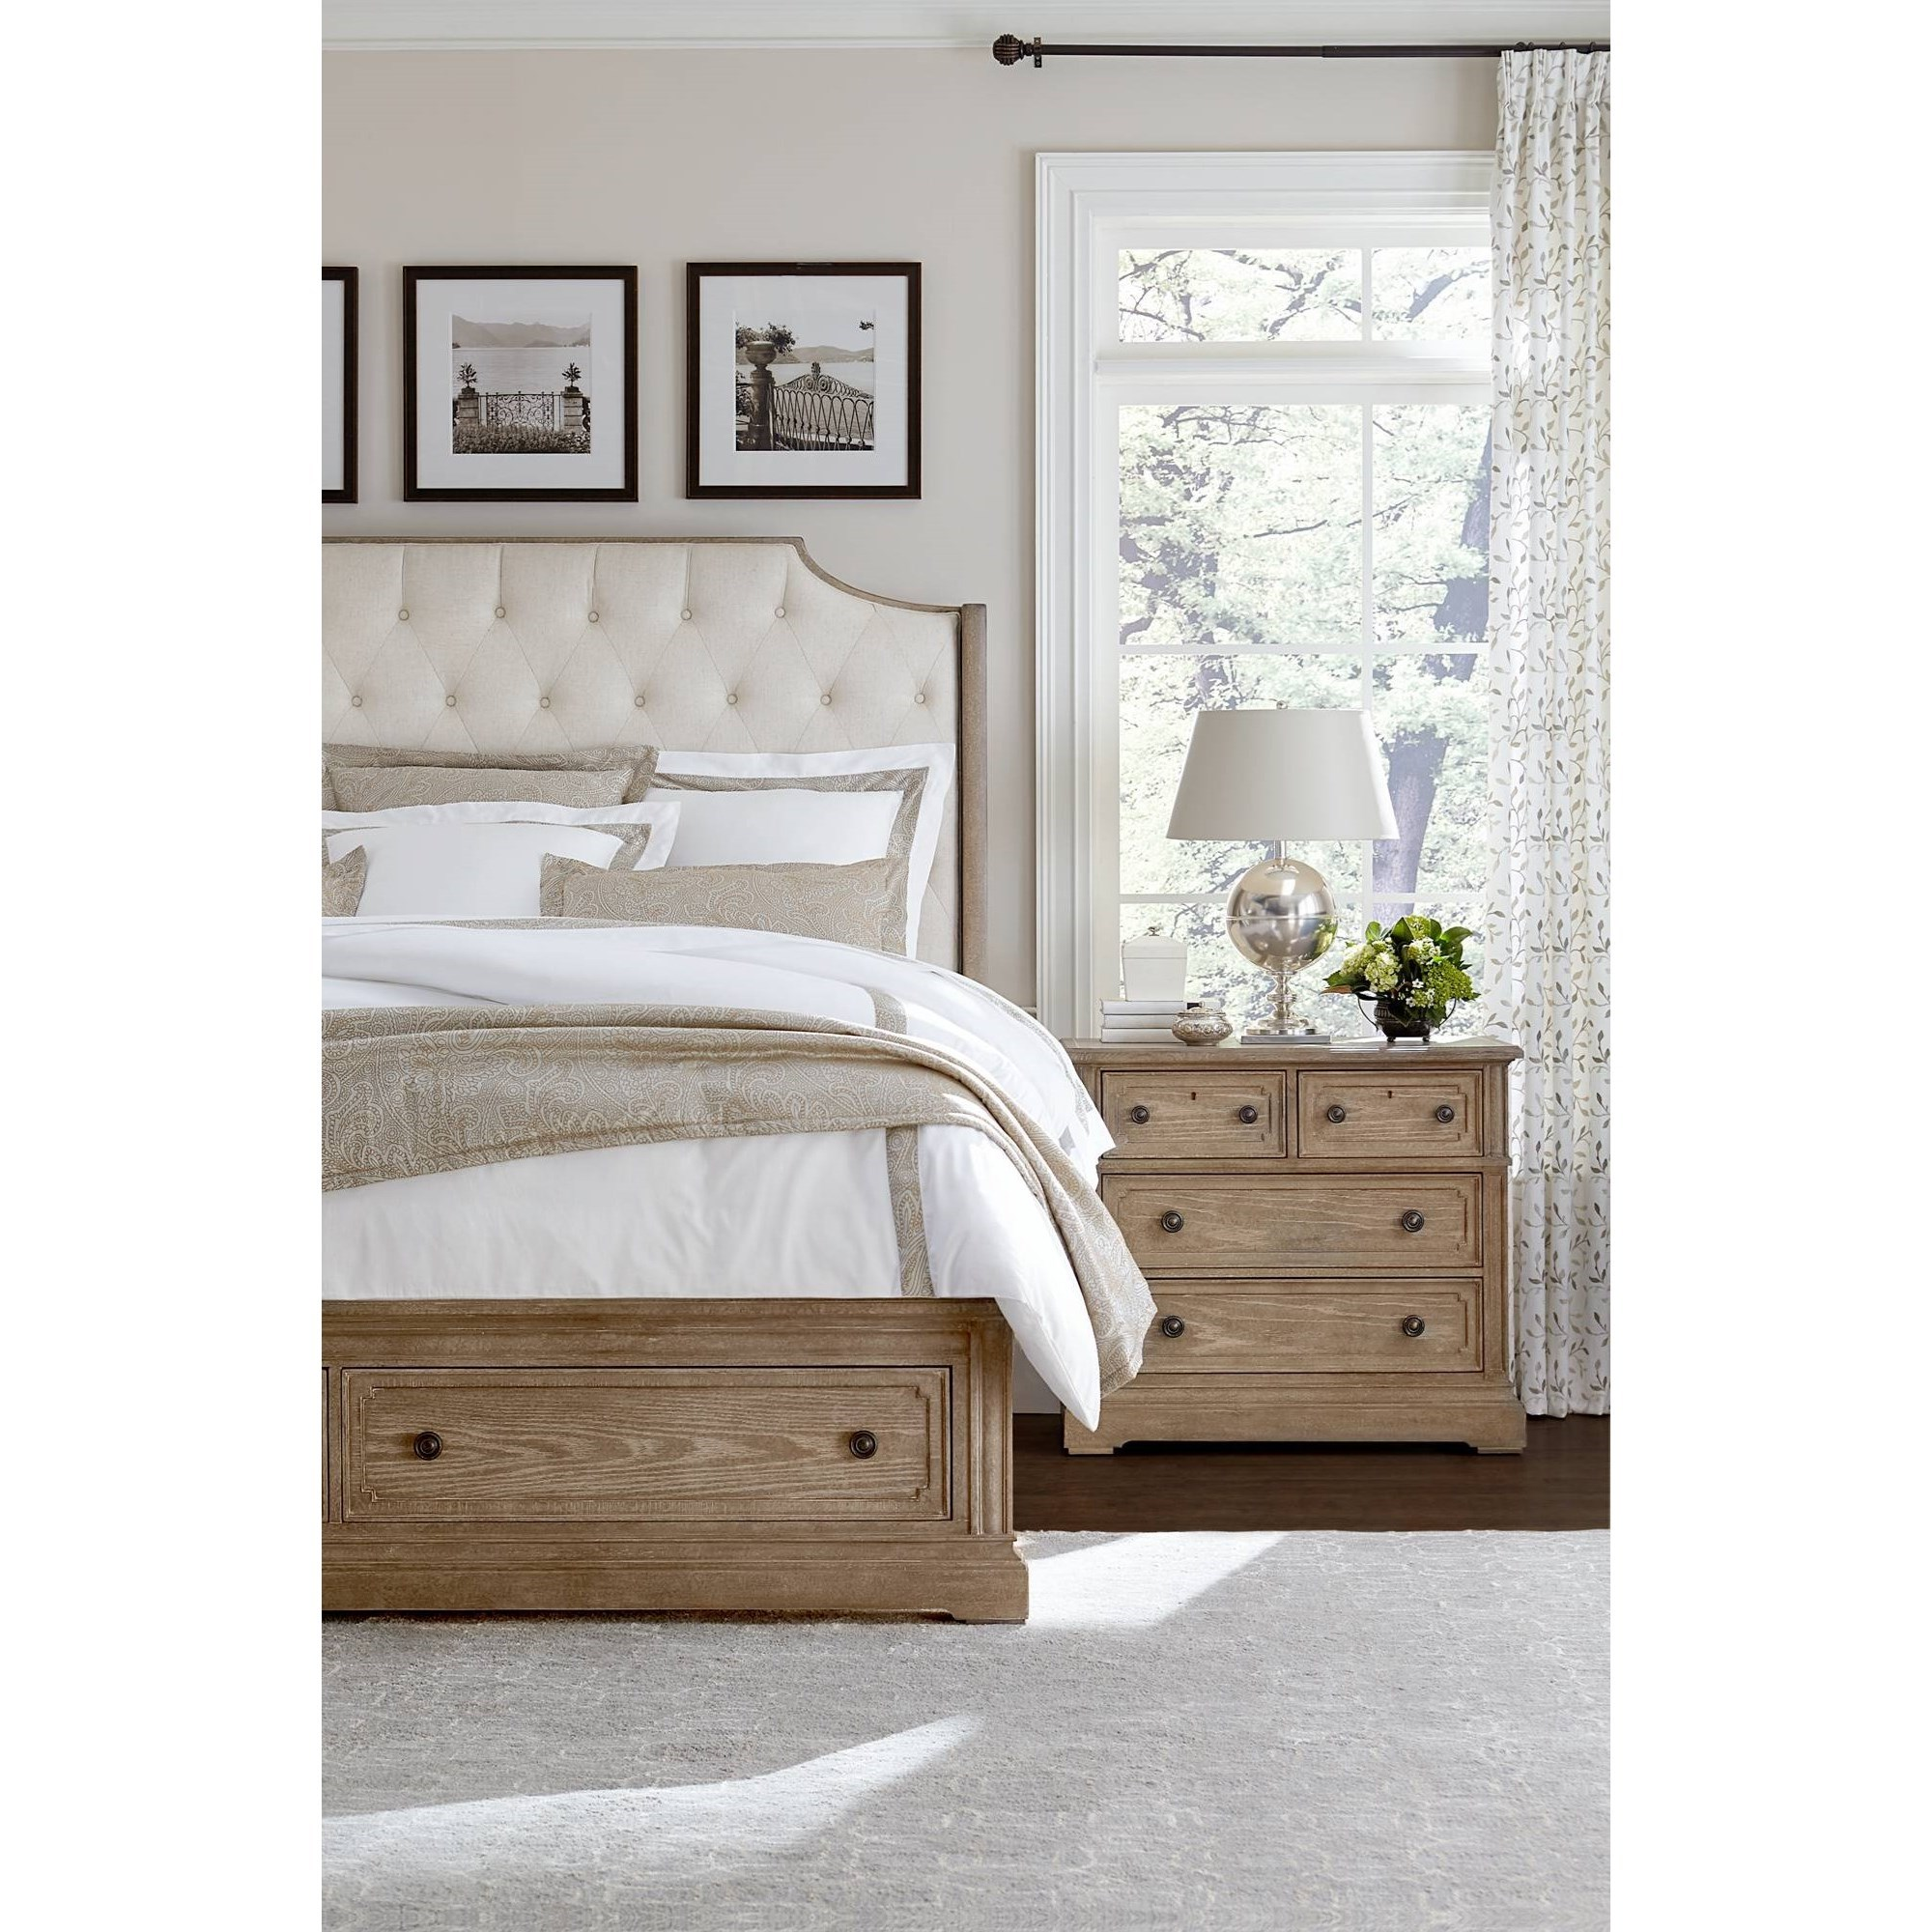 Stanley Furniture Wethersfield Estate King Bedroom Group